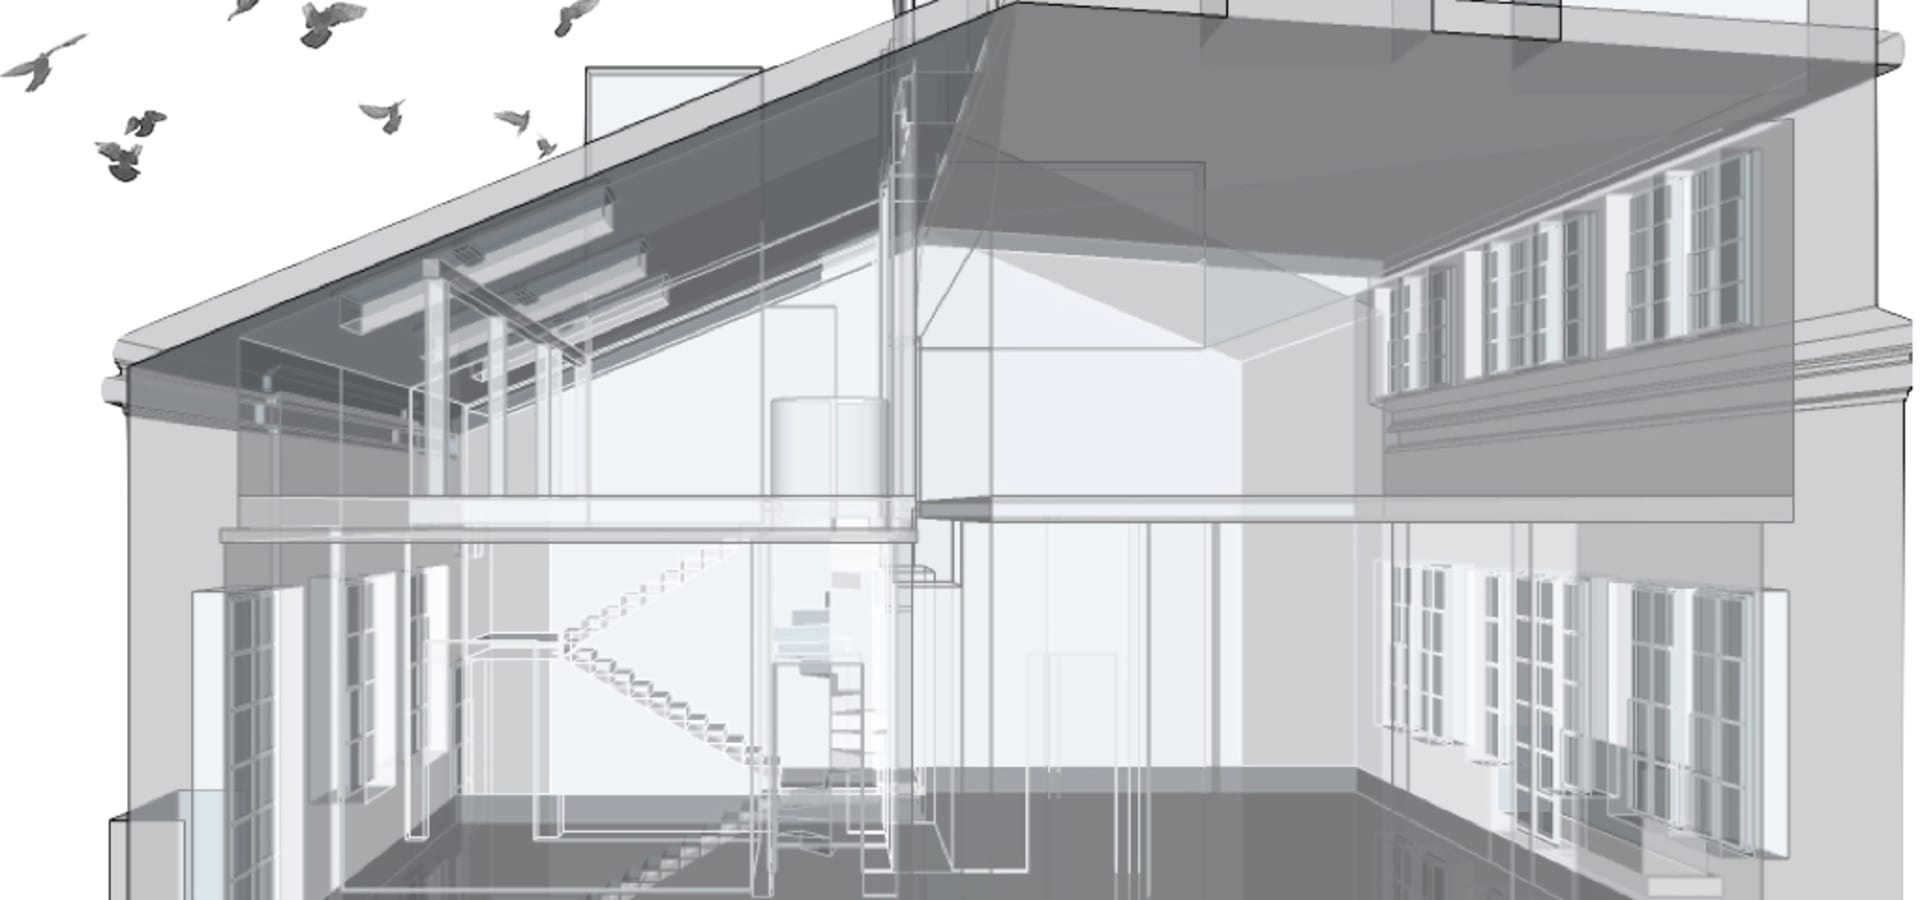 HalabisArchitektura